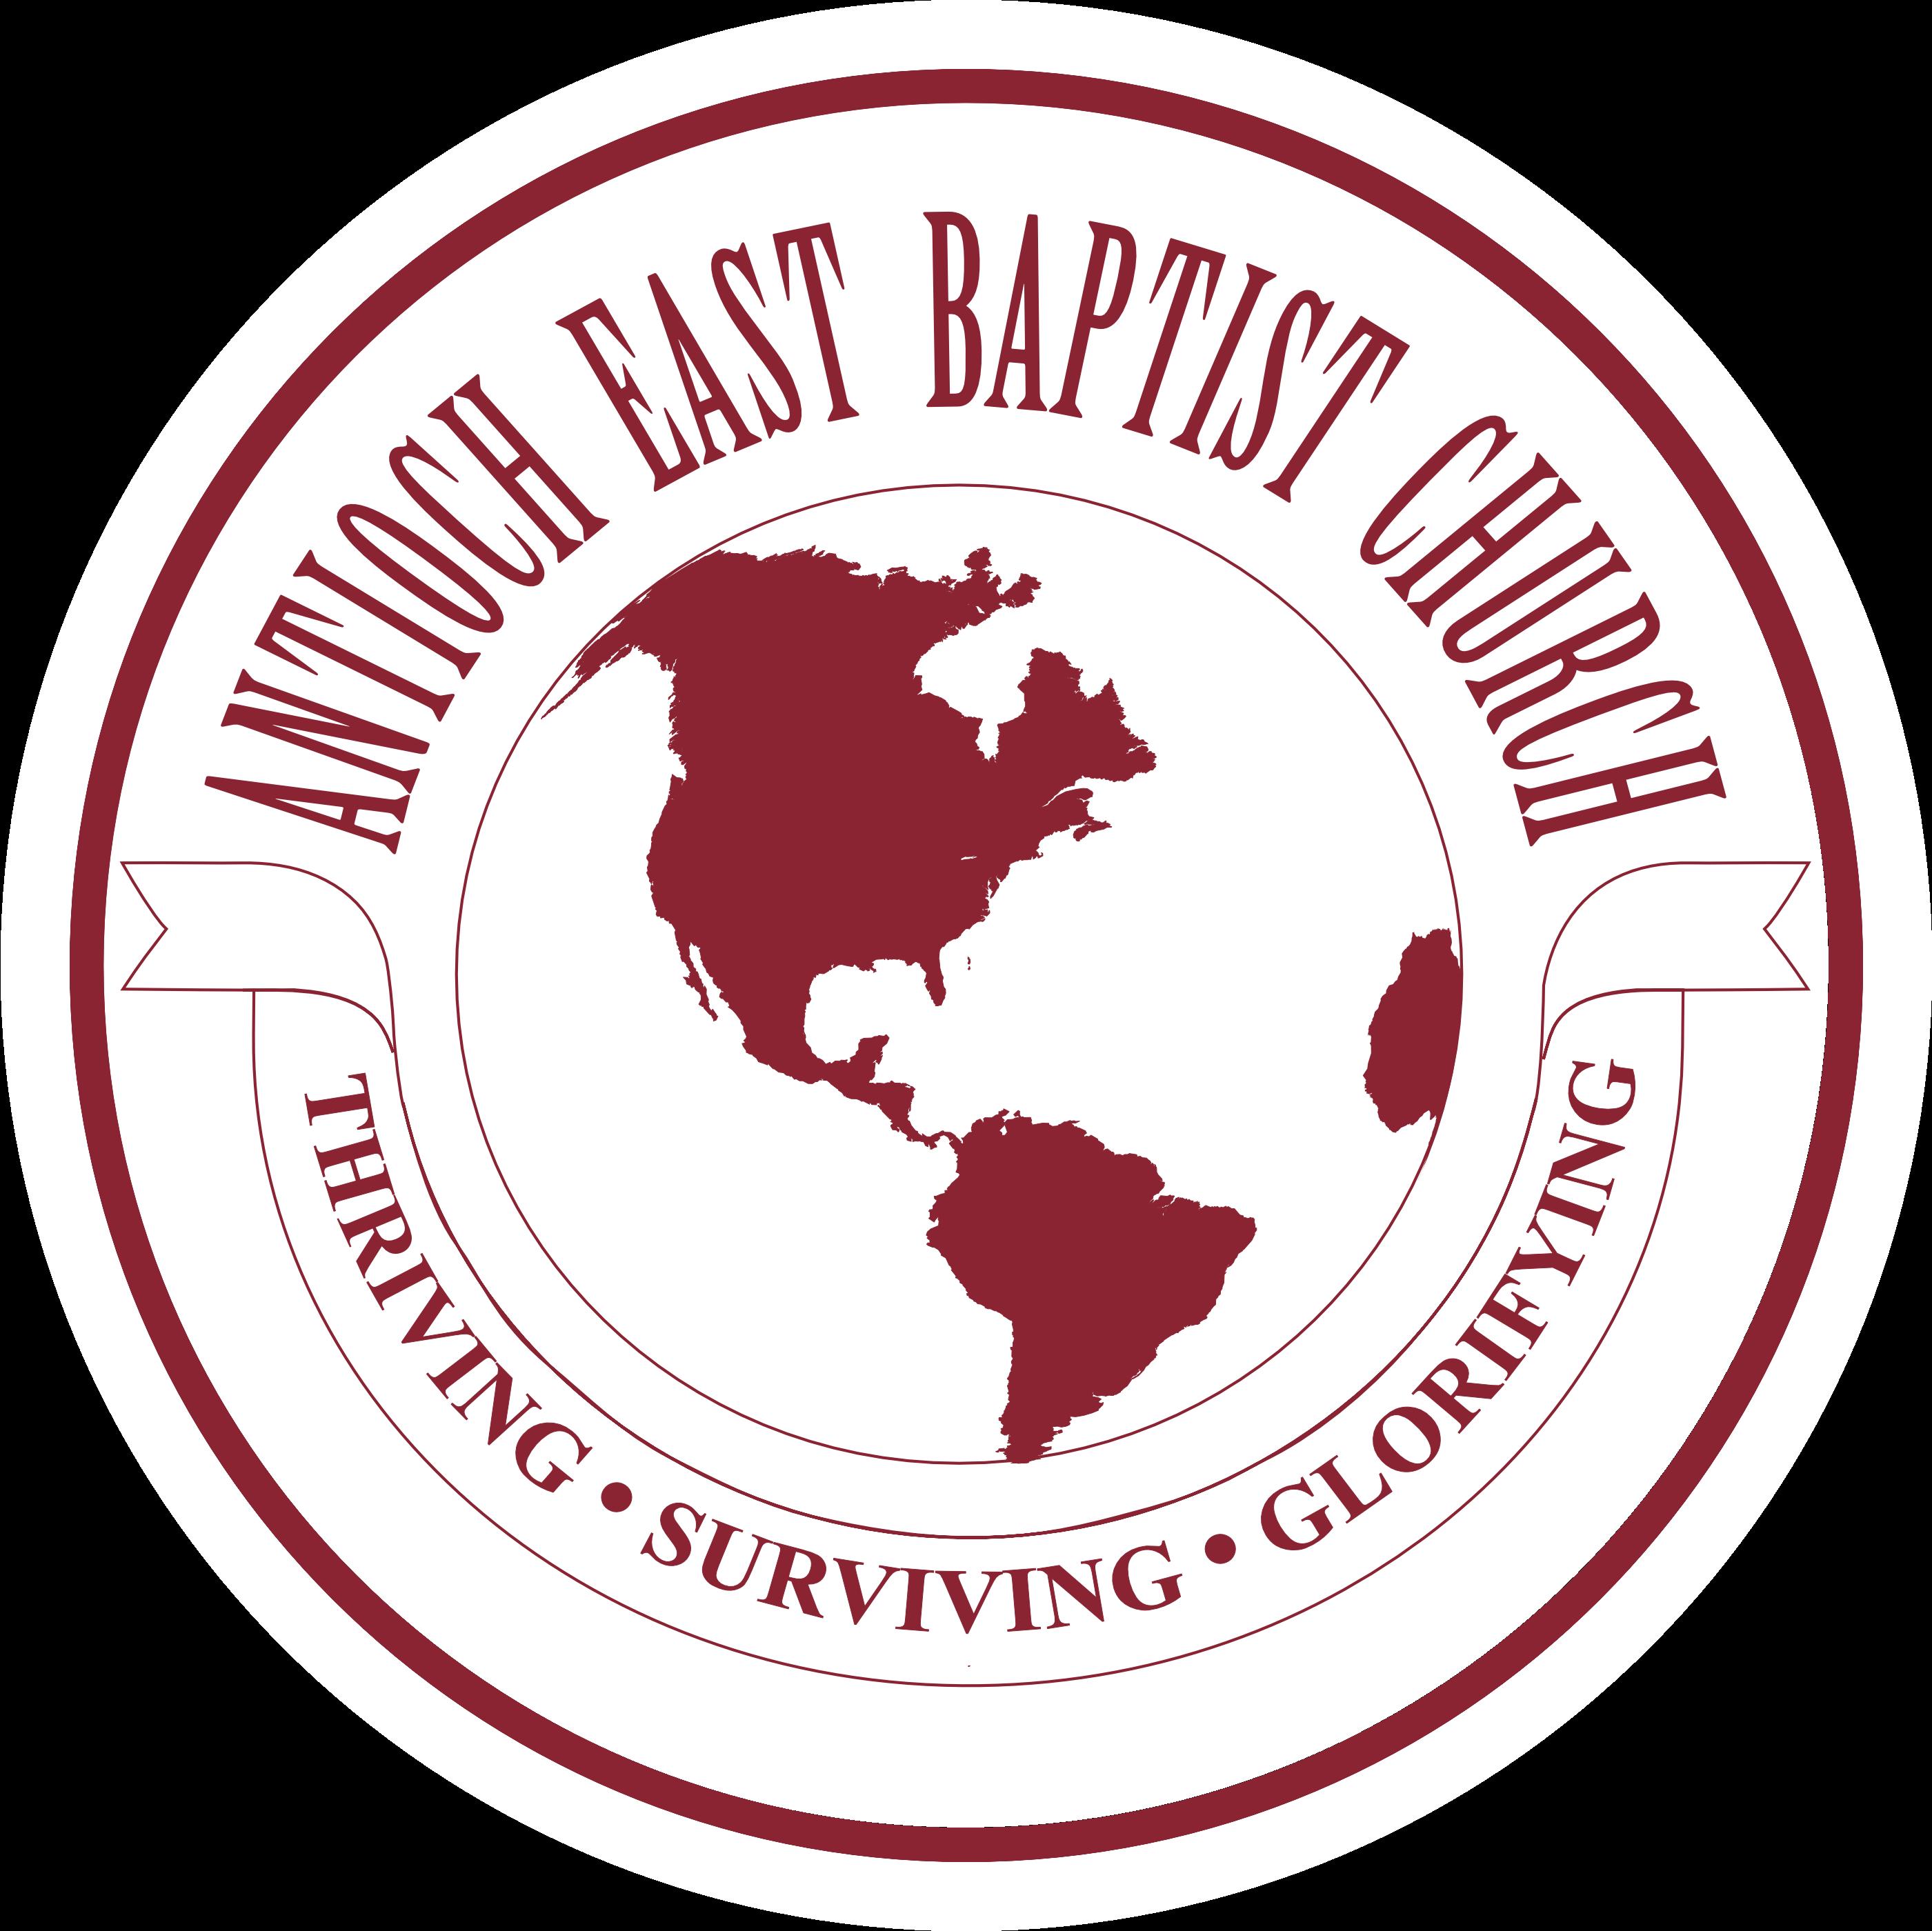 Antioch East Baptist Chruch header logo